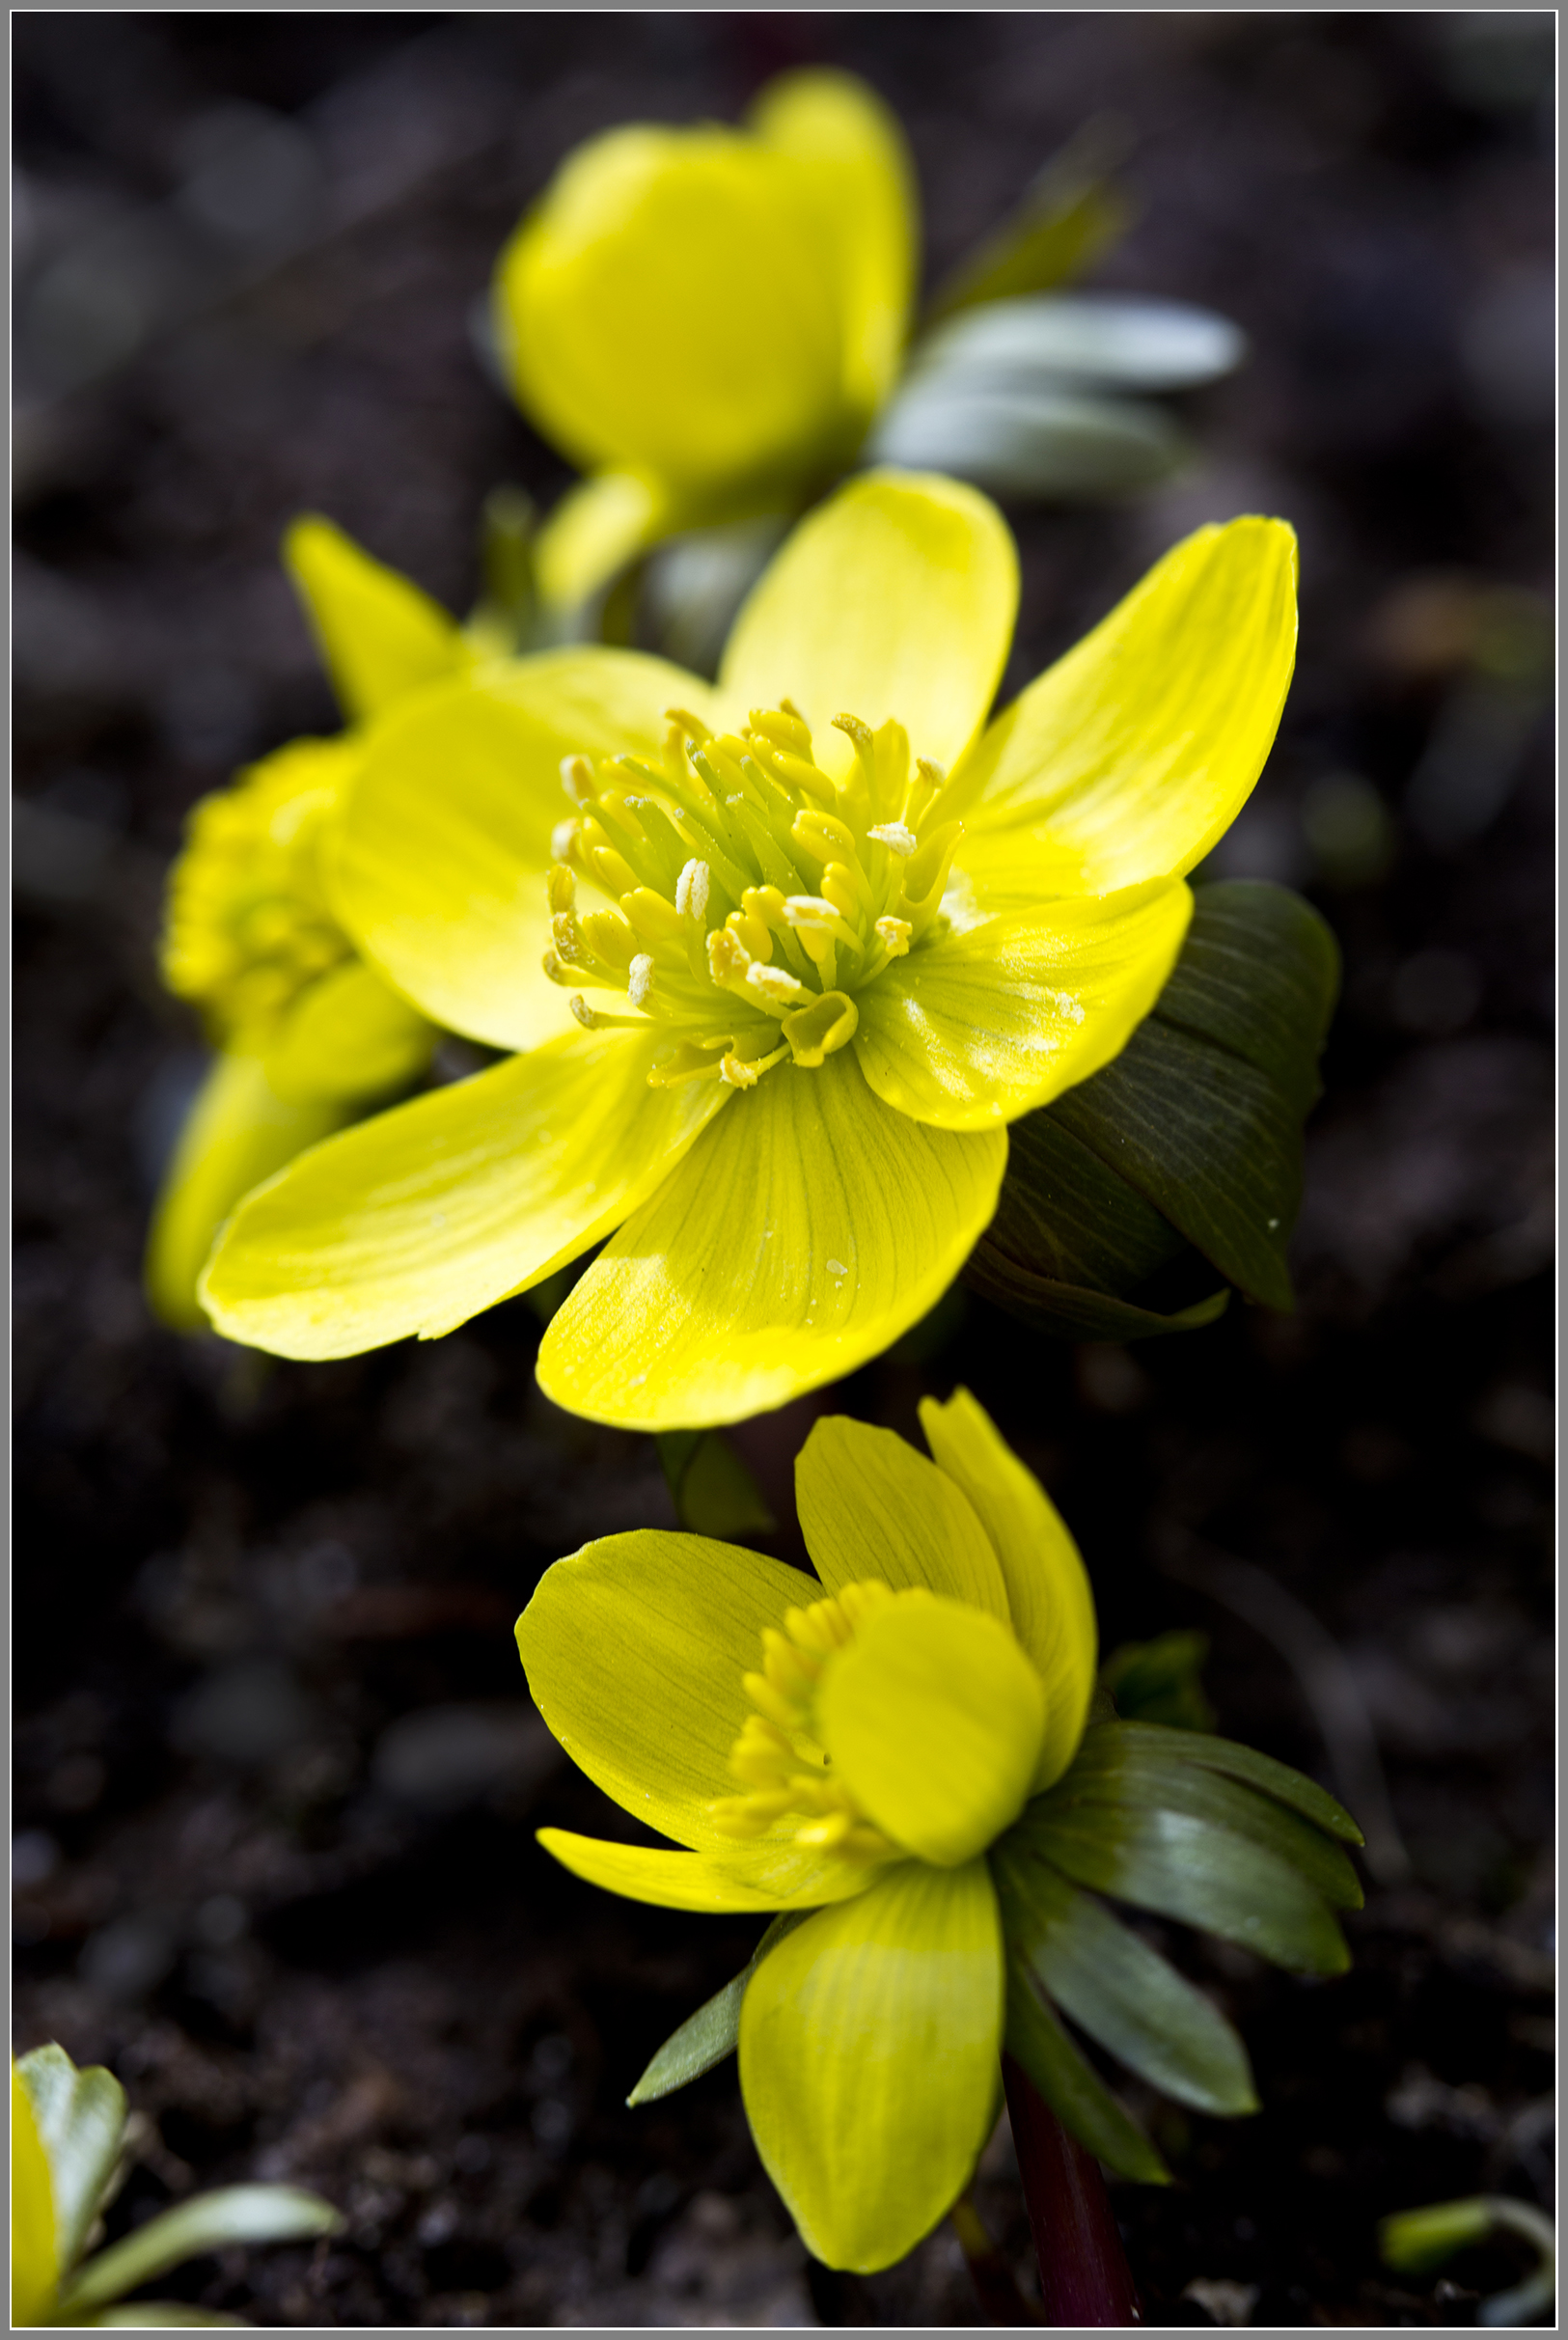 Ranunculus5518jpgs.jpg